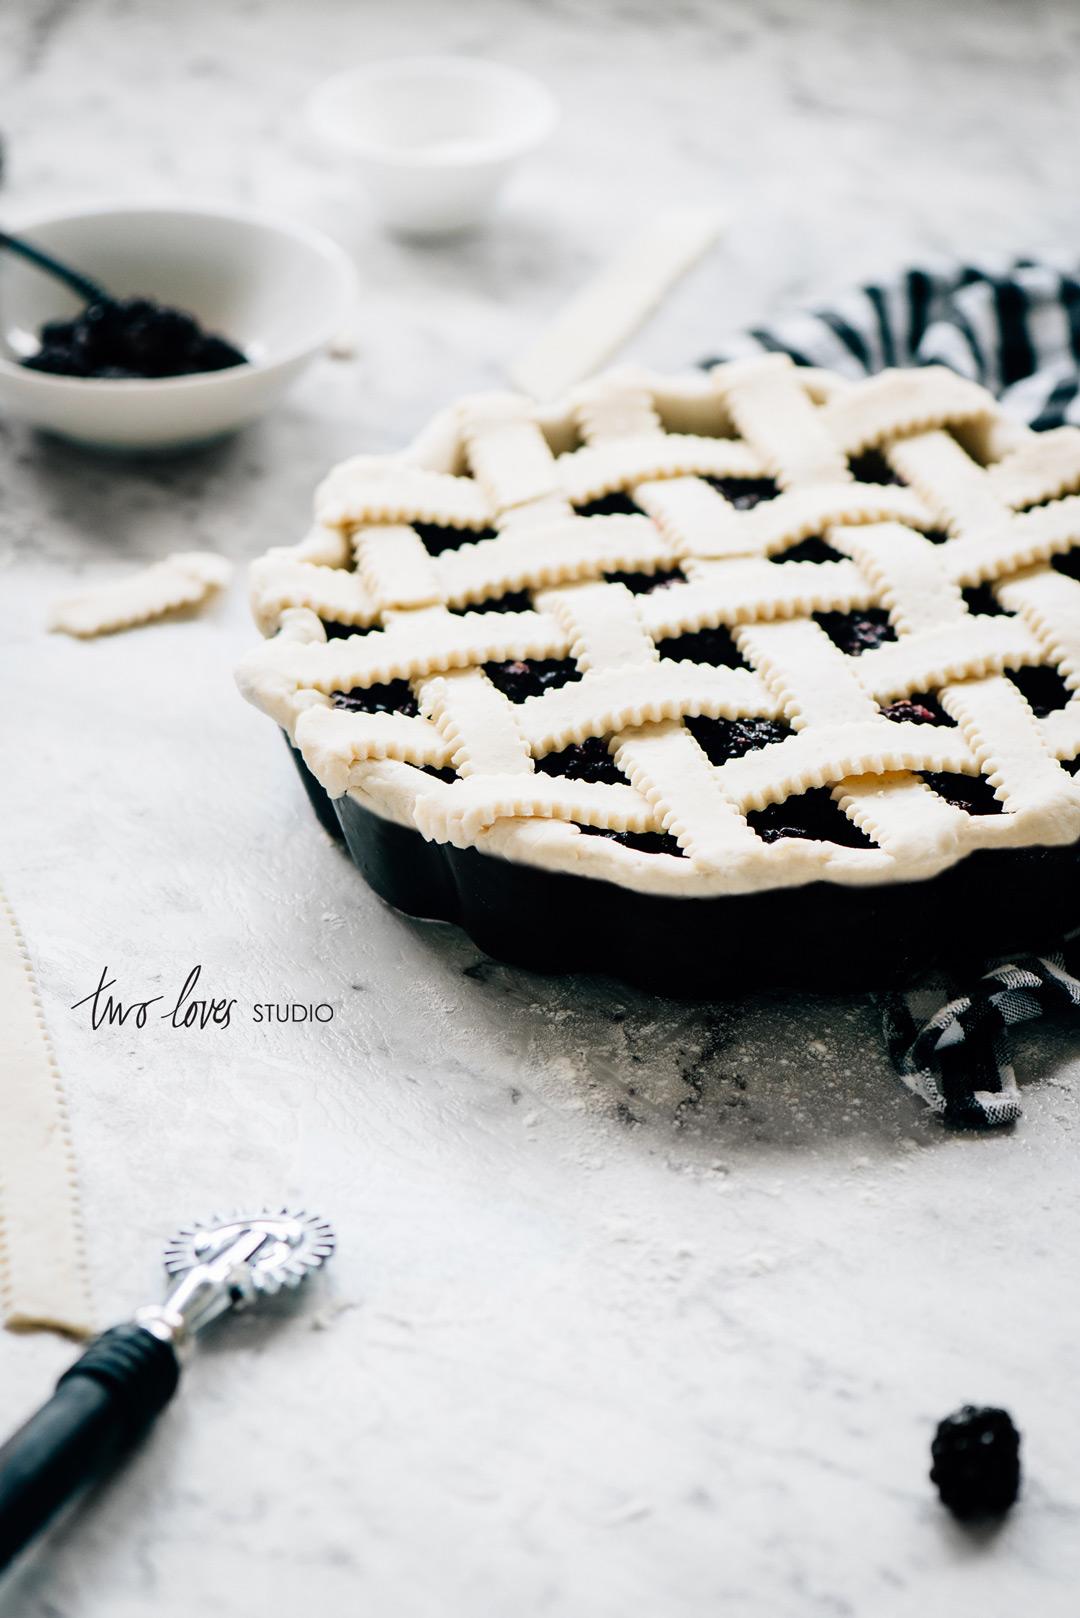 Two Loves Studio Black White Food Photography Blackberry Pie